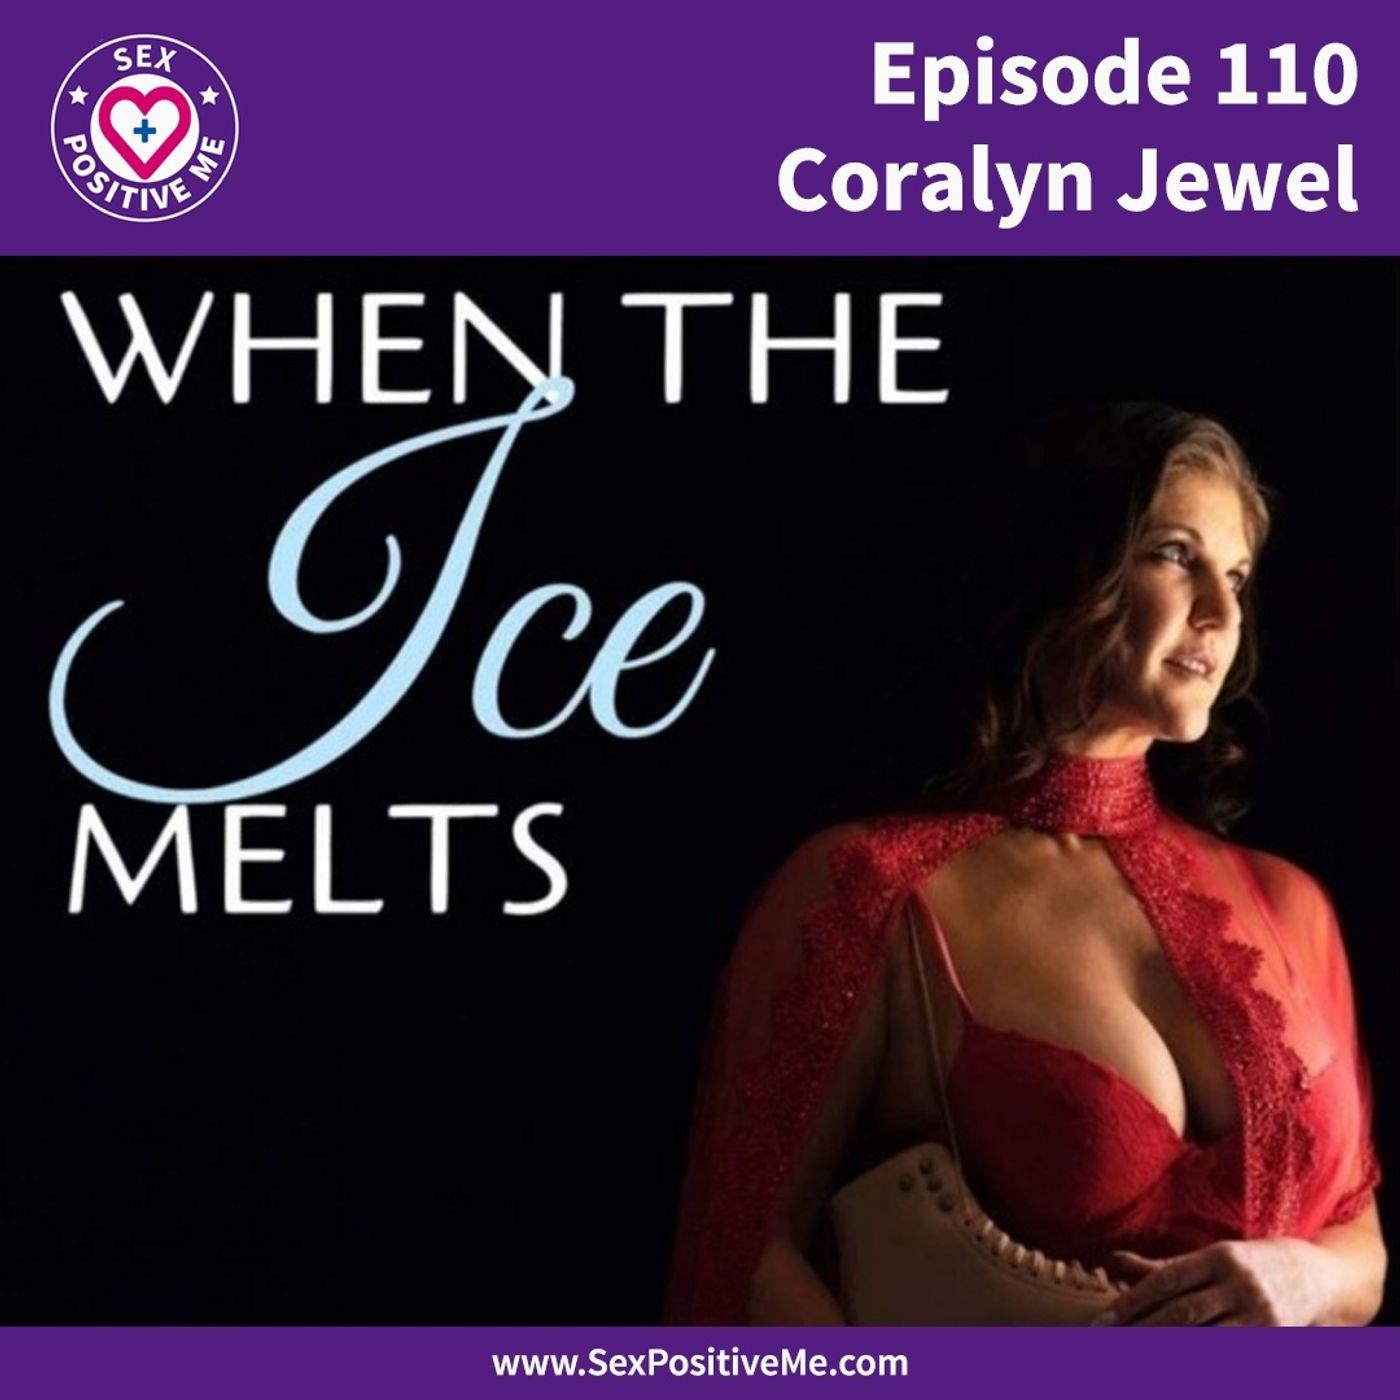 Sex Positive Me - E110: Coralyn Jewel